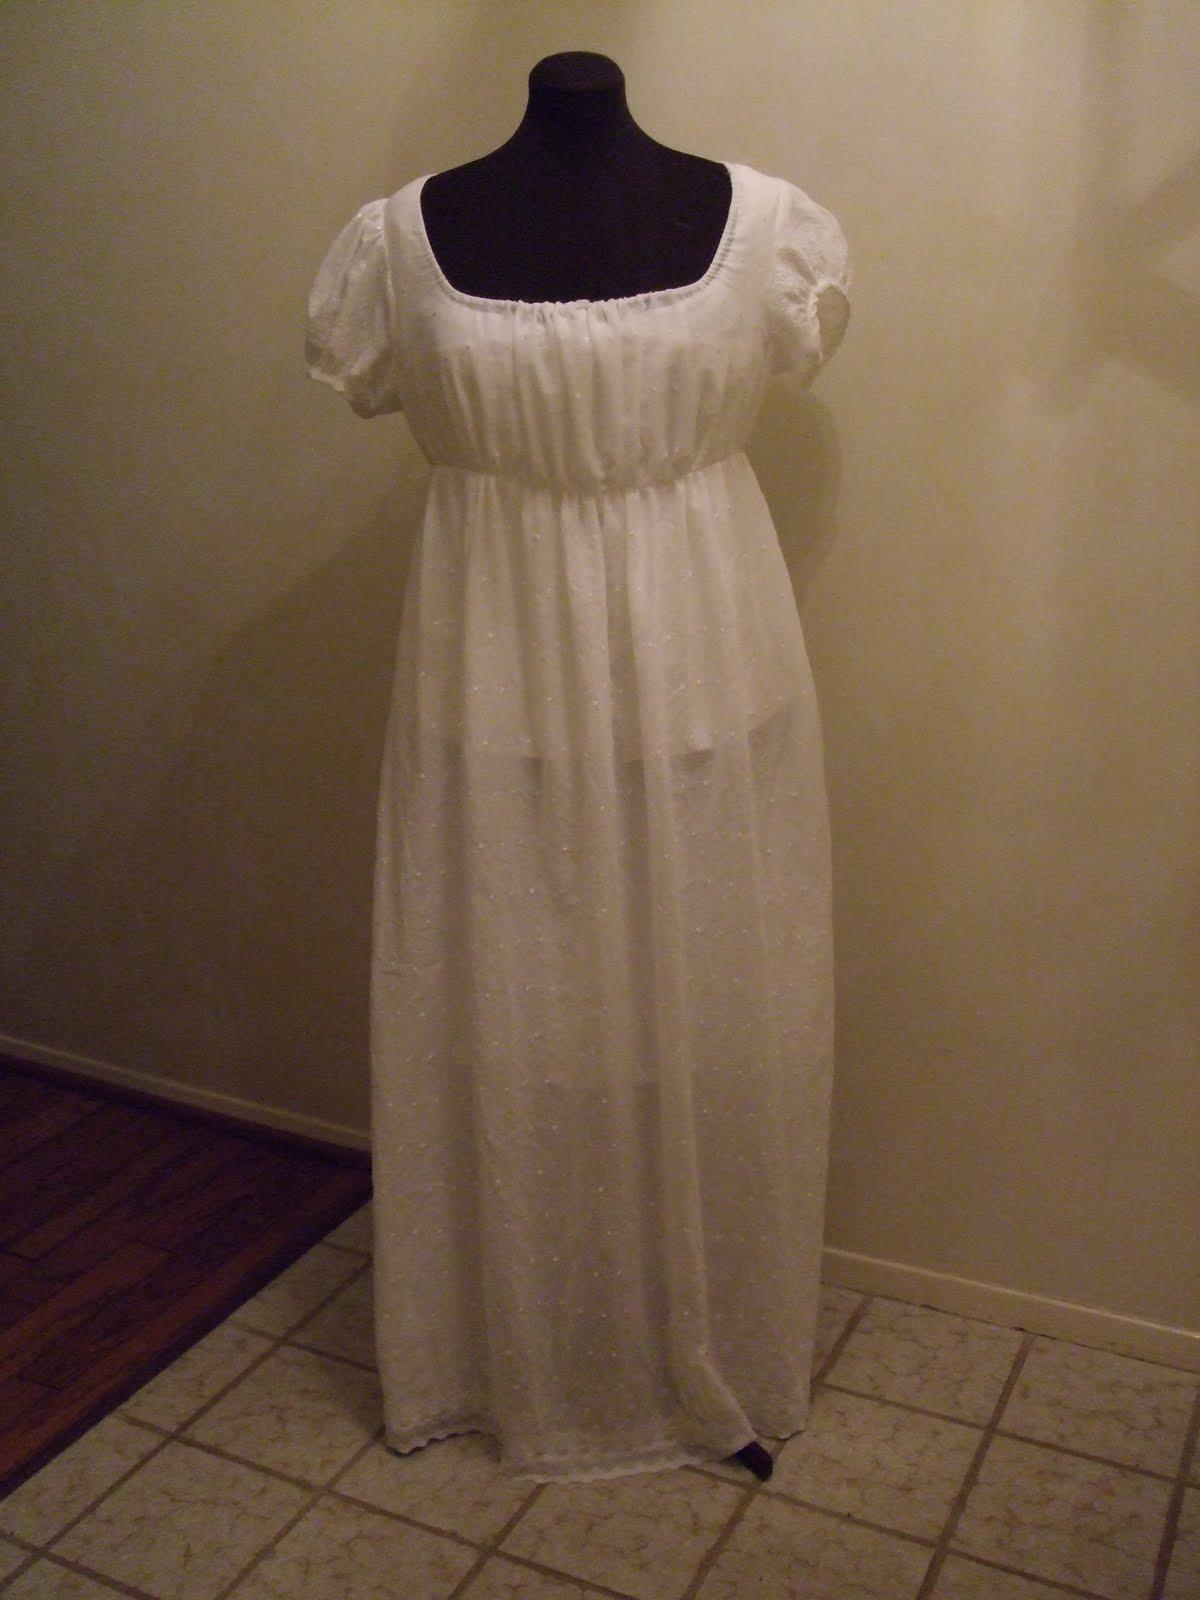 Maggie\'s Costume Wardrobe: White cotton regency gown